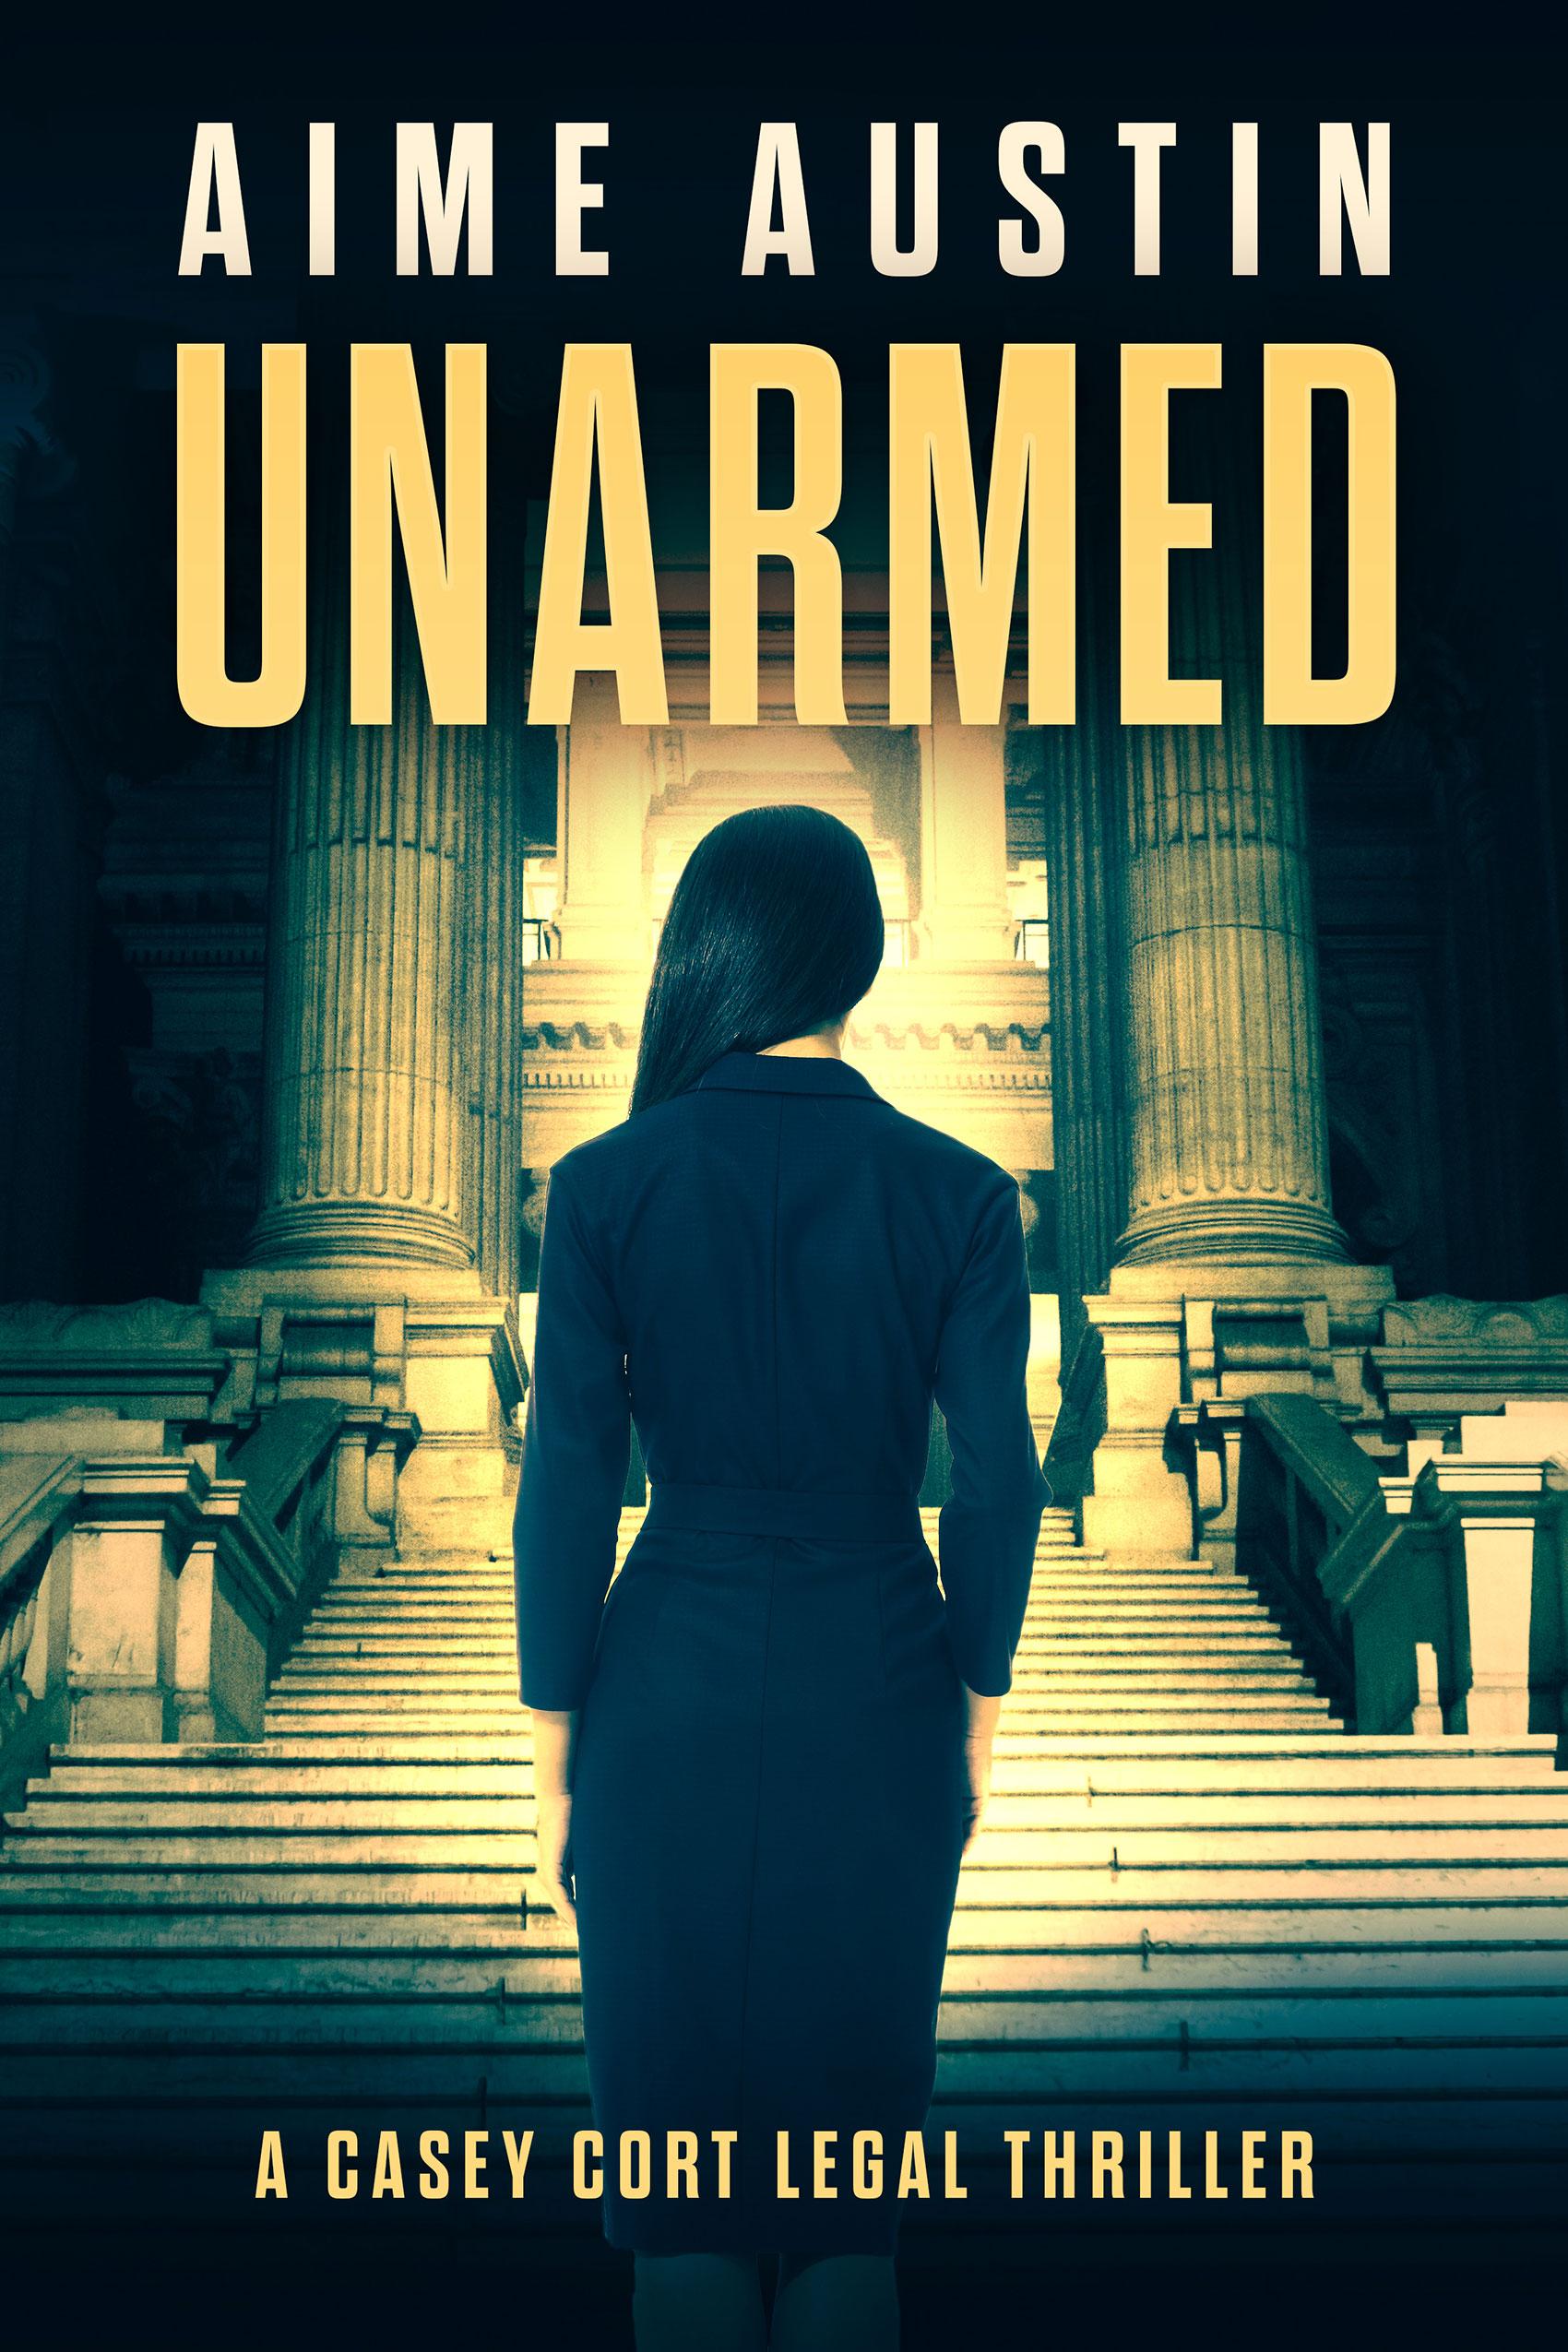 Unarmed Aime Austin